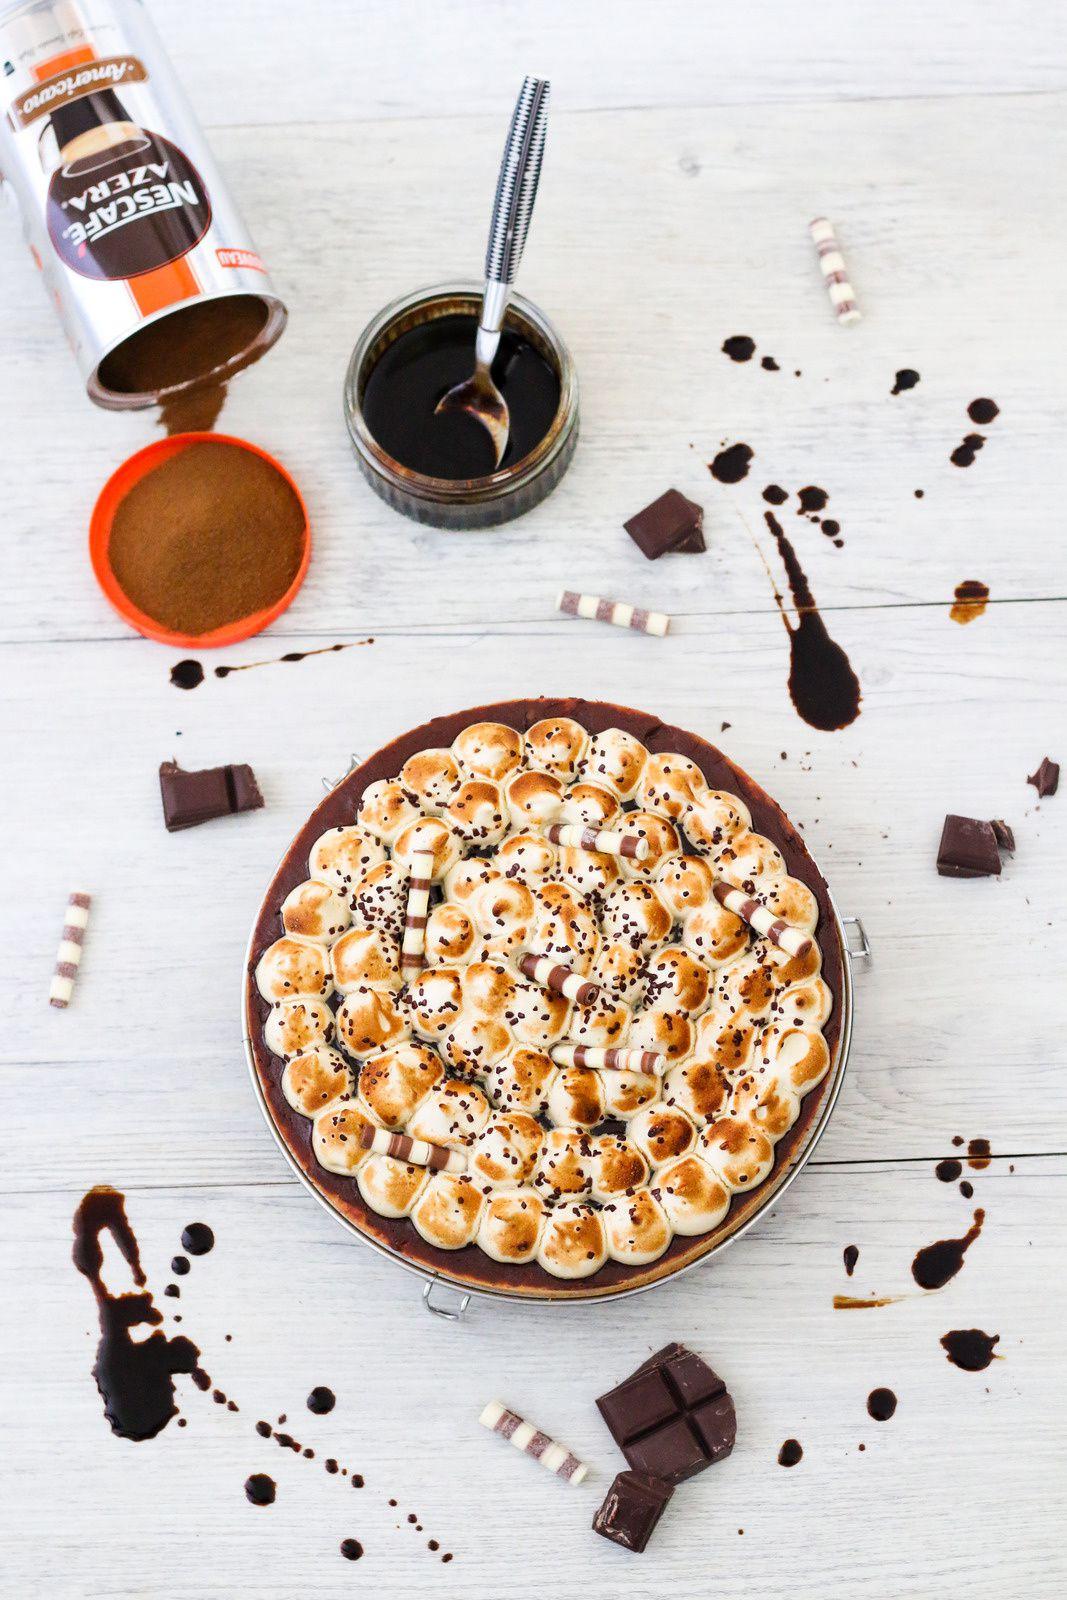 Tarte au chocolat, caramel & meringue italienne au café ( Dégustabox août 2018 )